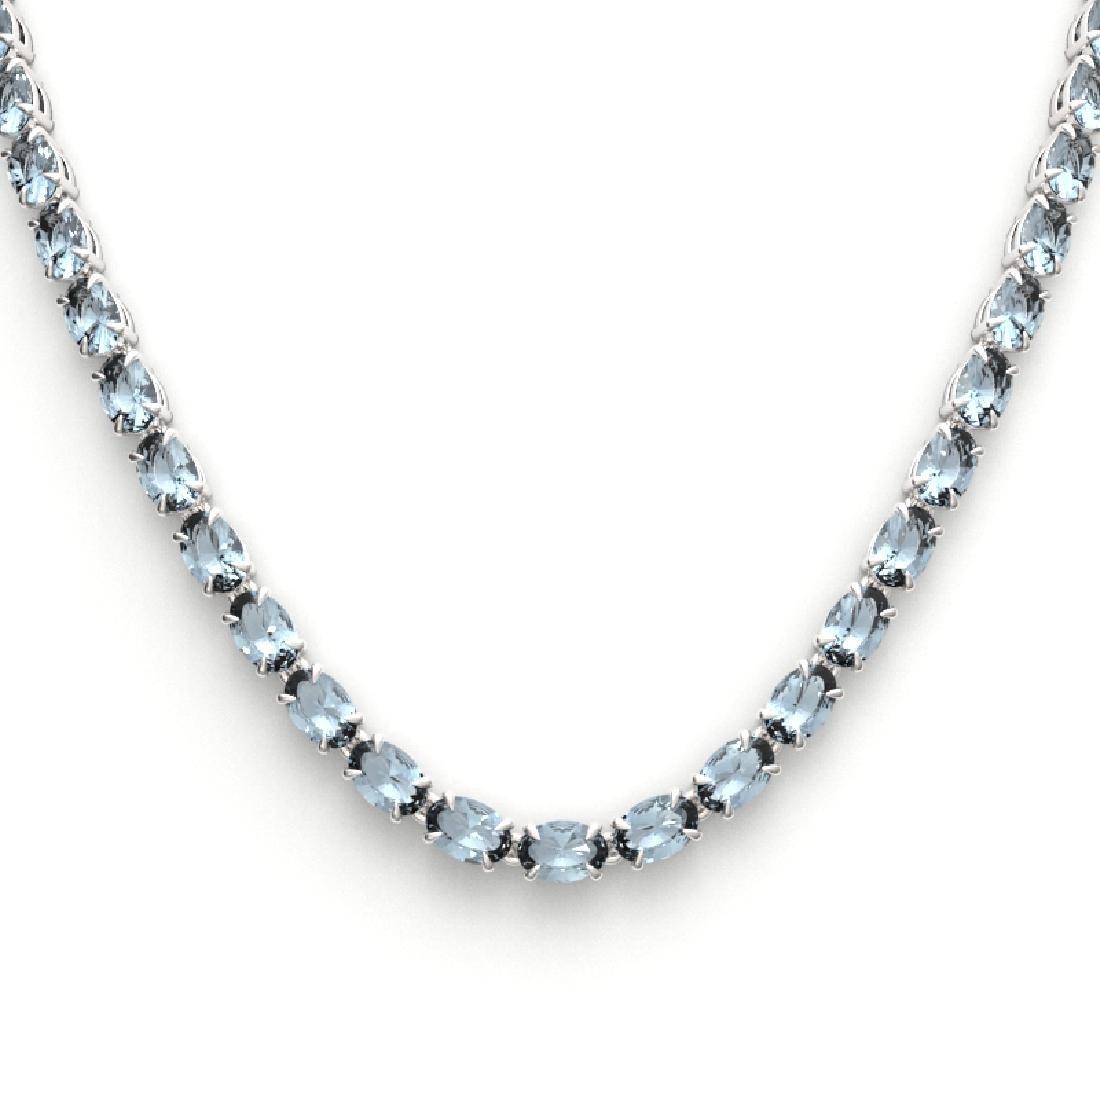 29 CTW Aquamarine Eternity Tennis Necklace 14K White - 2